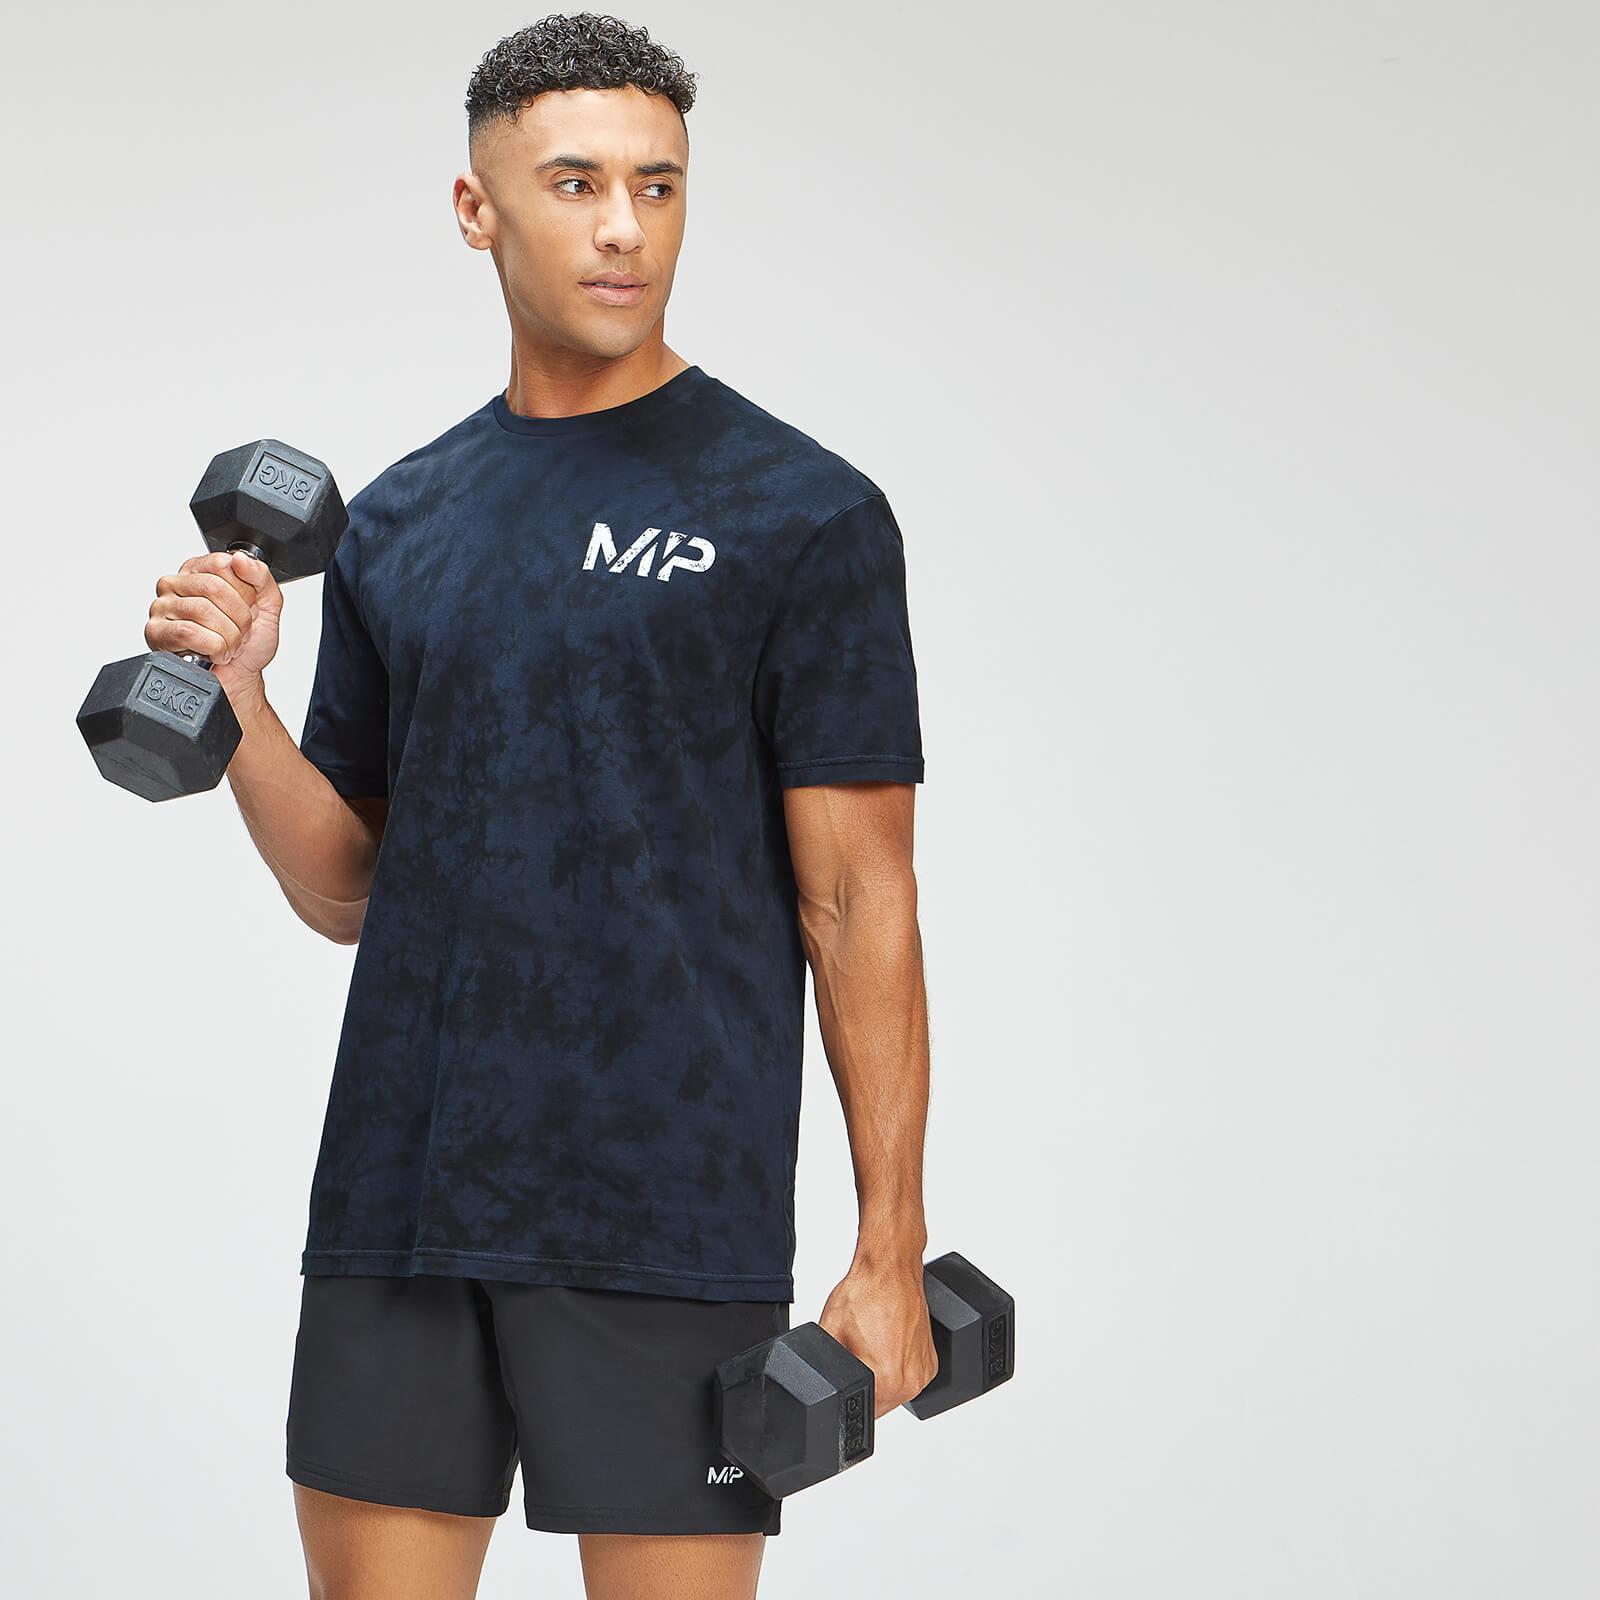 Купить MP Men's Adapt Tie Dye Short Sleeve Oversized T-Shirt - Petrol Blue/Black - XXS, Myprotein International